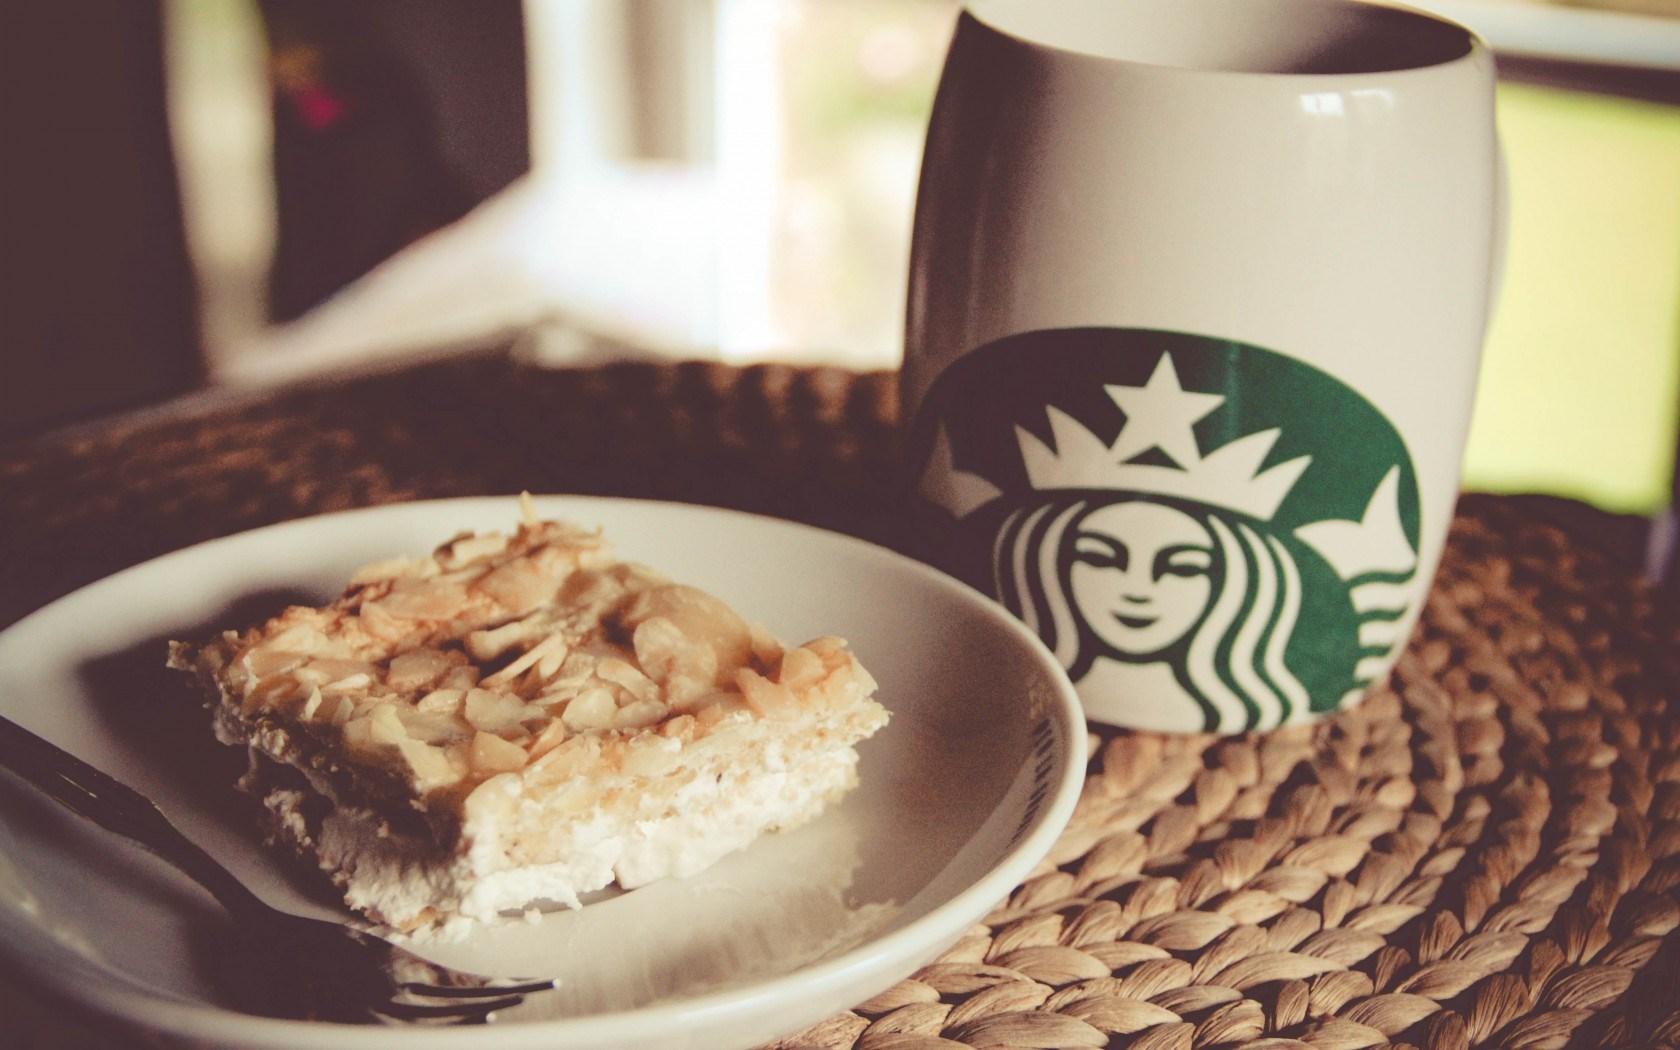 Starbucks Cup Pie